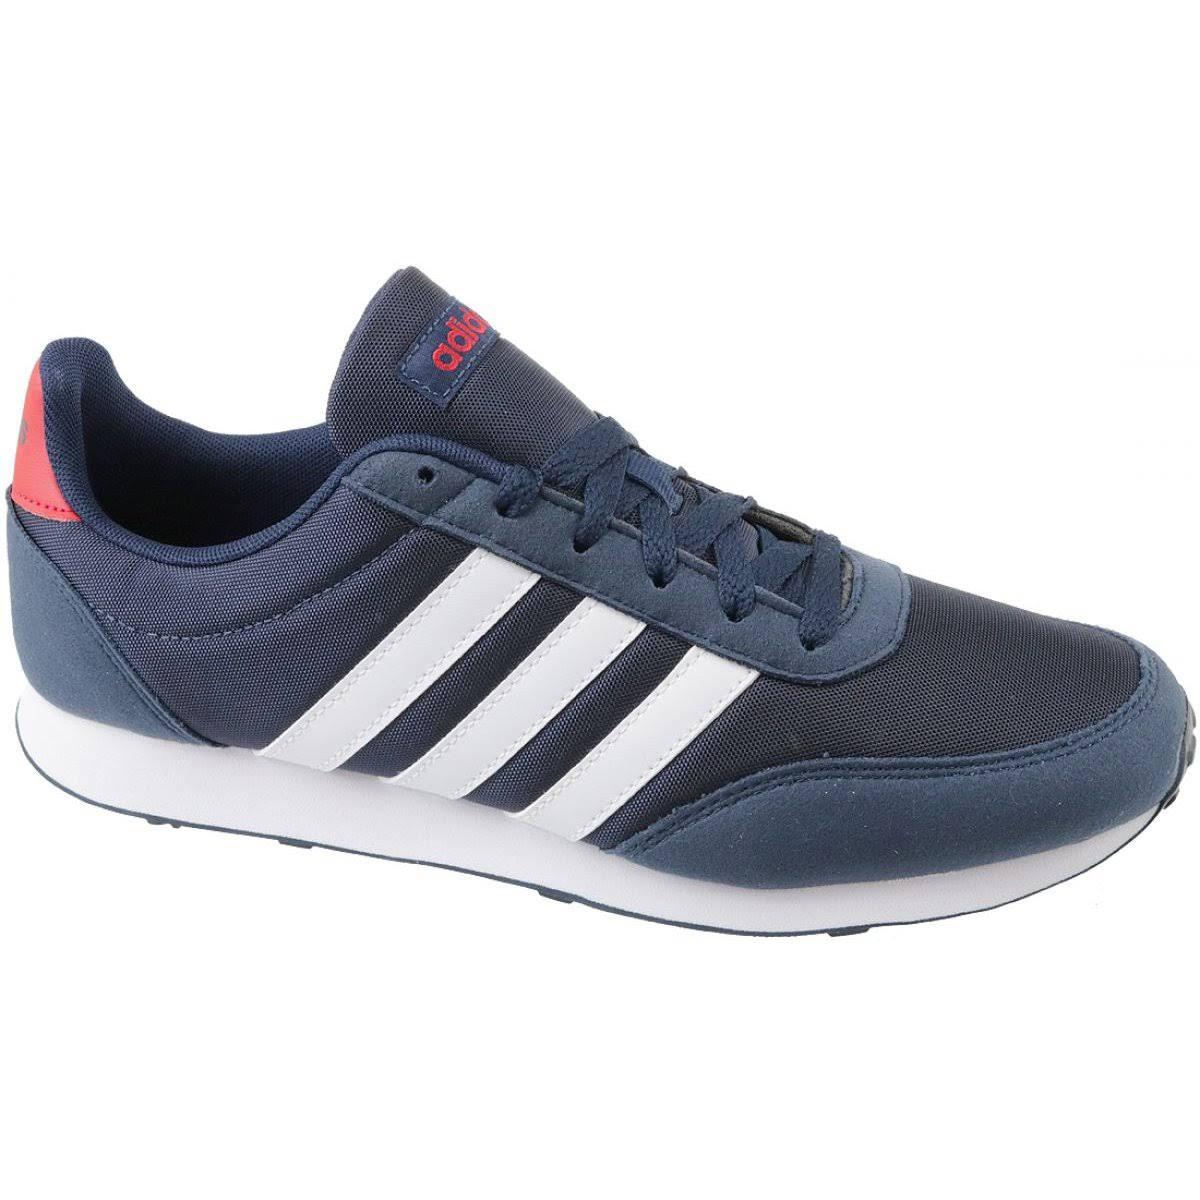 Adidas V Racer 2.0 M CG5706 Shoes Navy